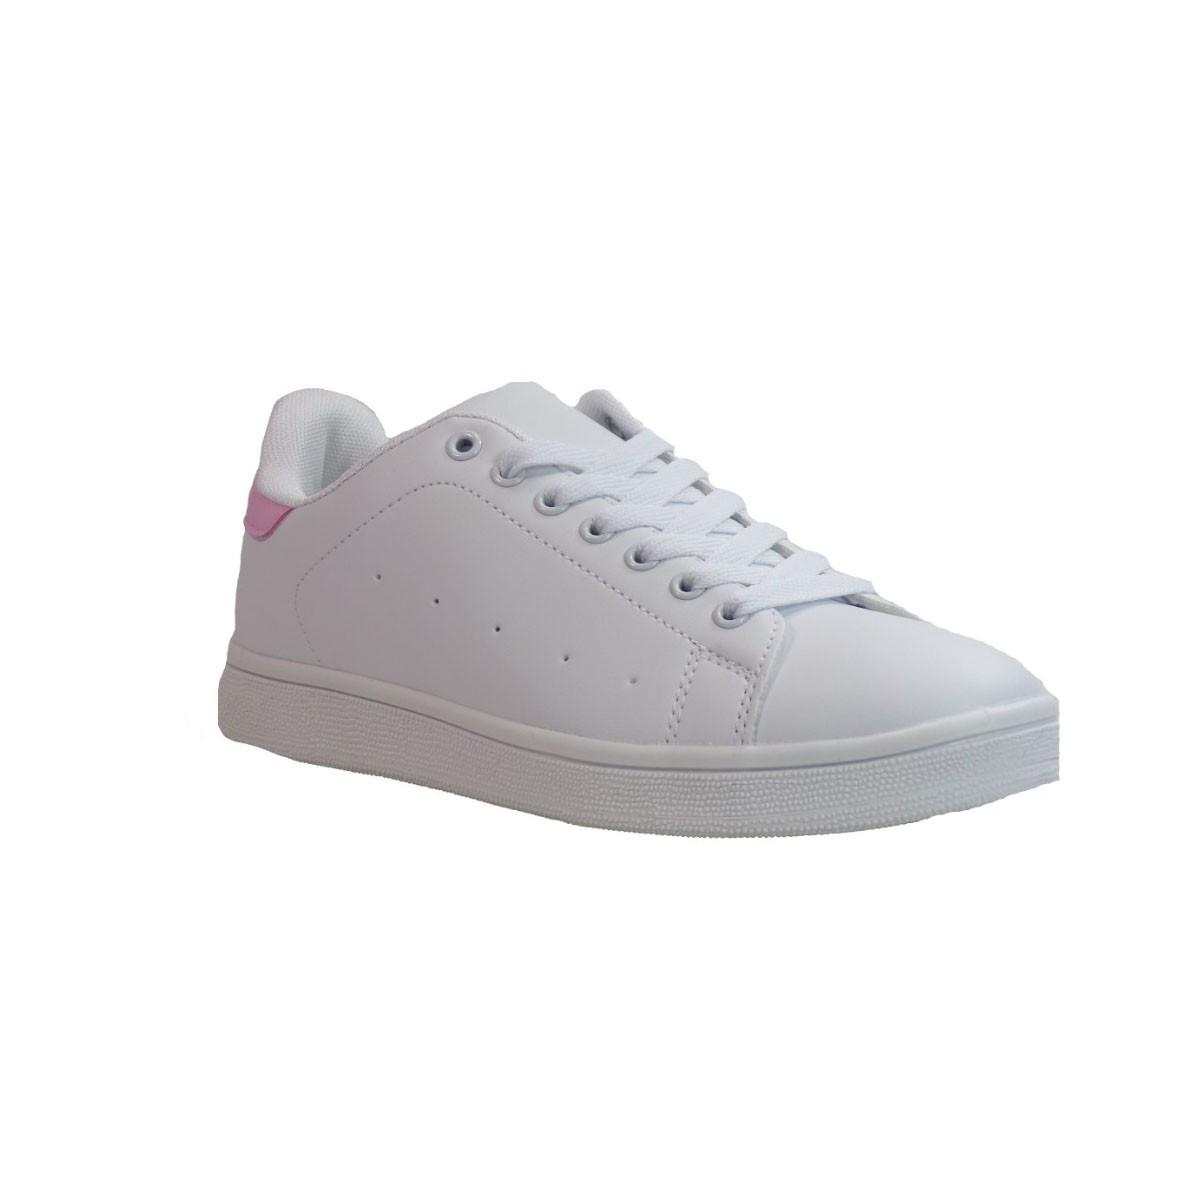 Bagiota shoes Sneakers Παπούτσια Γυναικεία Β2009-6 Άσπρο Ροζ Bagiota shoes Β2009-6 Άσπρο Ροζ